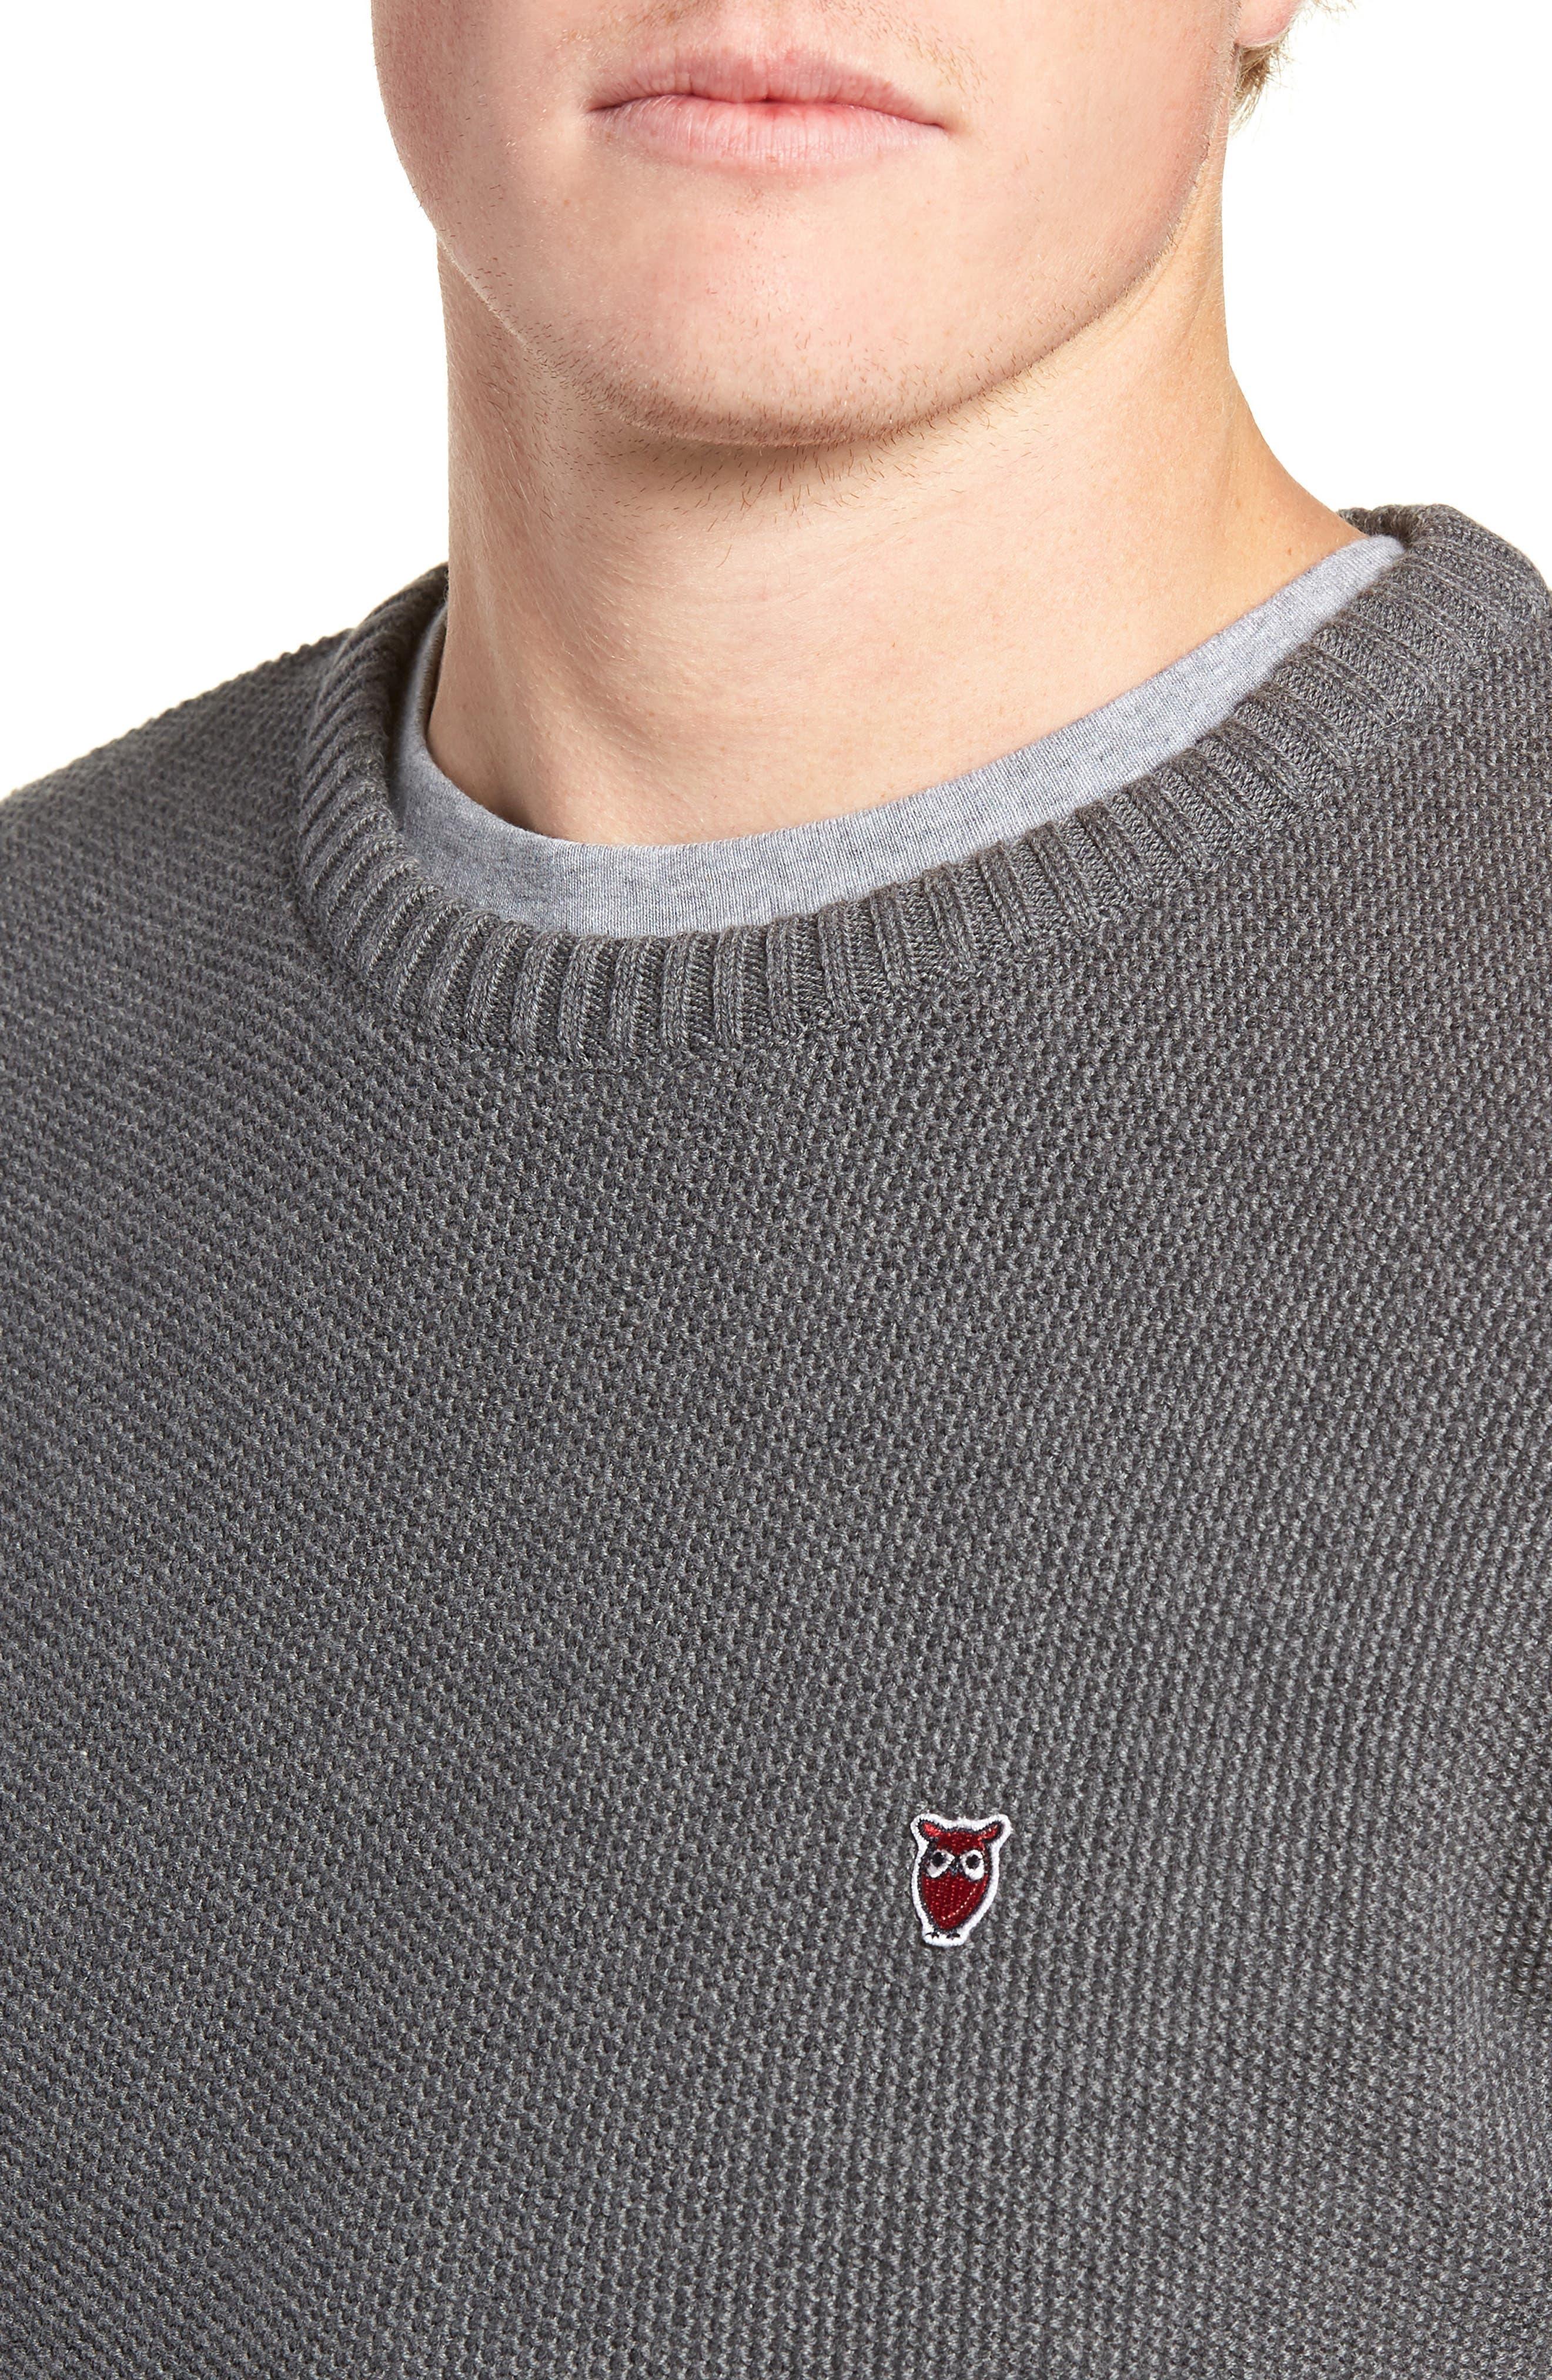 Owl Textured Sweater,                             Alternate thumbnail 4, color,                             GREY MELANGE